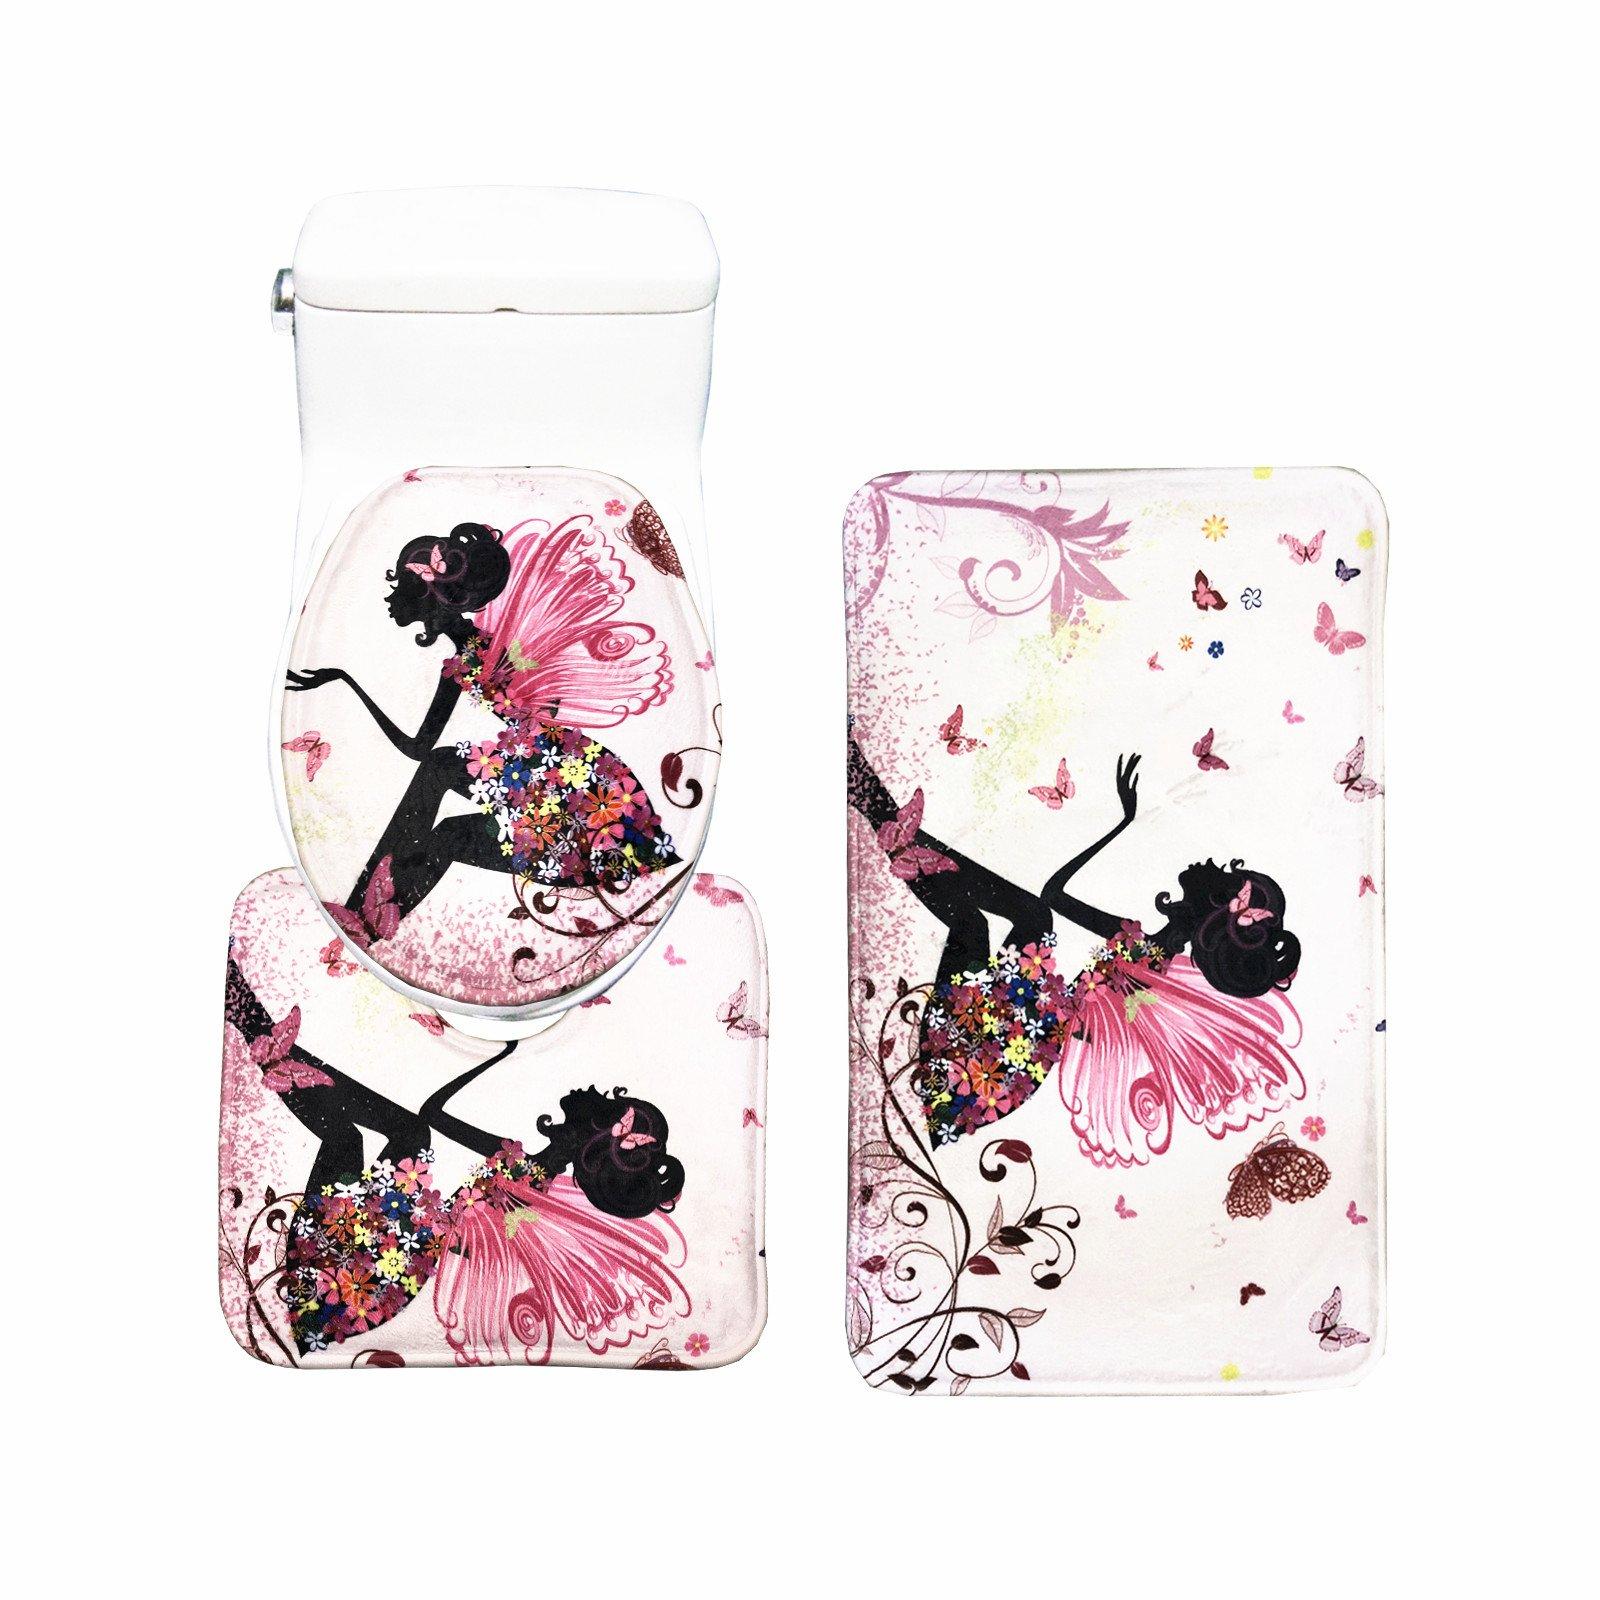 Amagical Flower Fairy Girl with Butterfly 3 Piece Bathroom Mat Set Bathroom Mat Contour Mat Toilet Cover Colorful